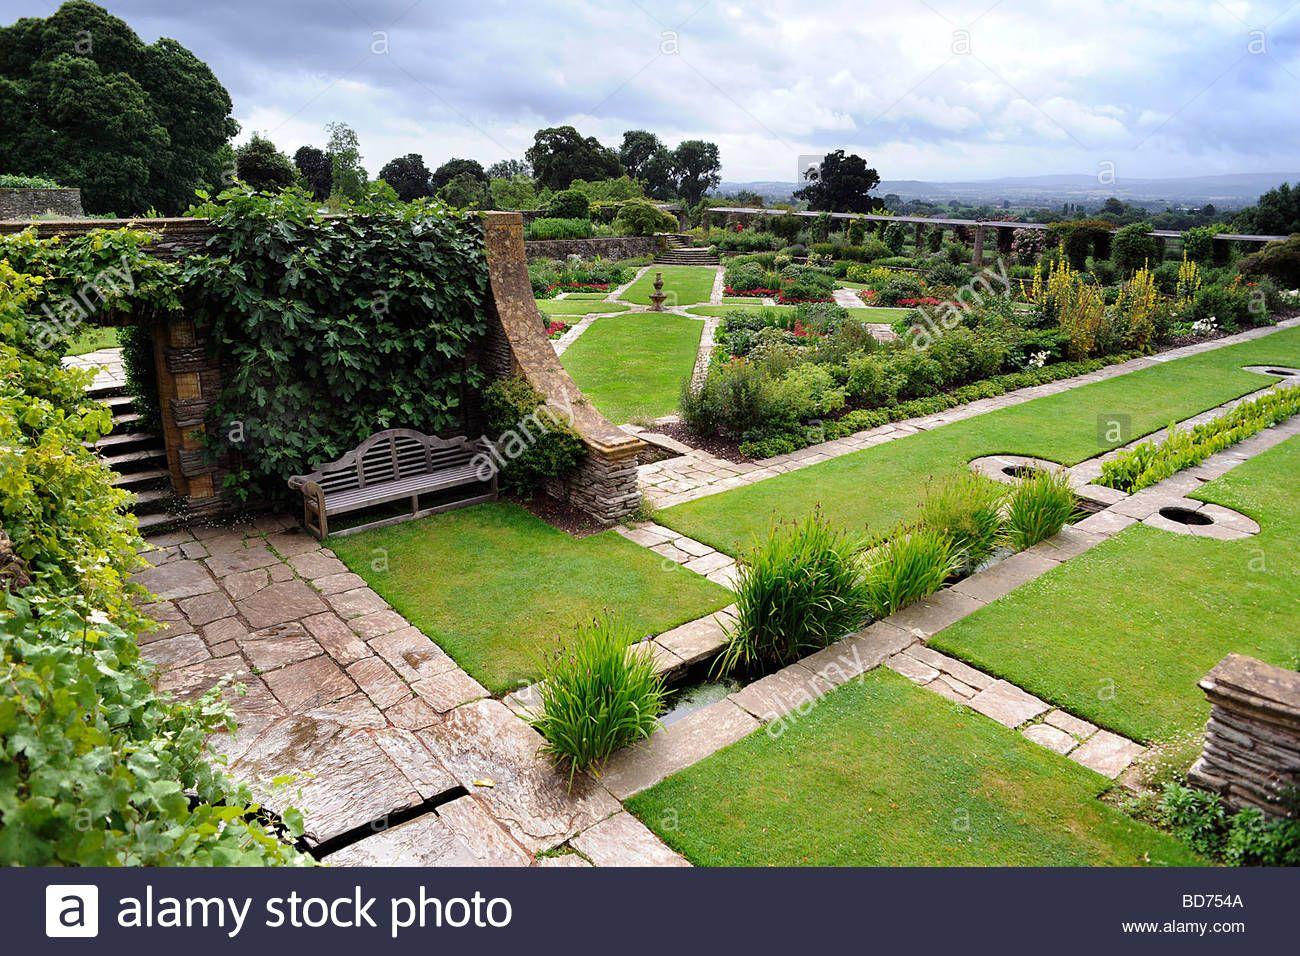 hestercombe-gardens-near-taunton-somerset-uk-landscaped ...